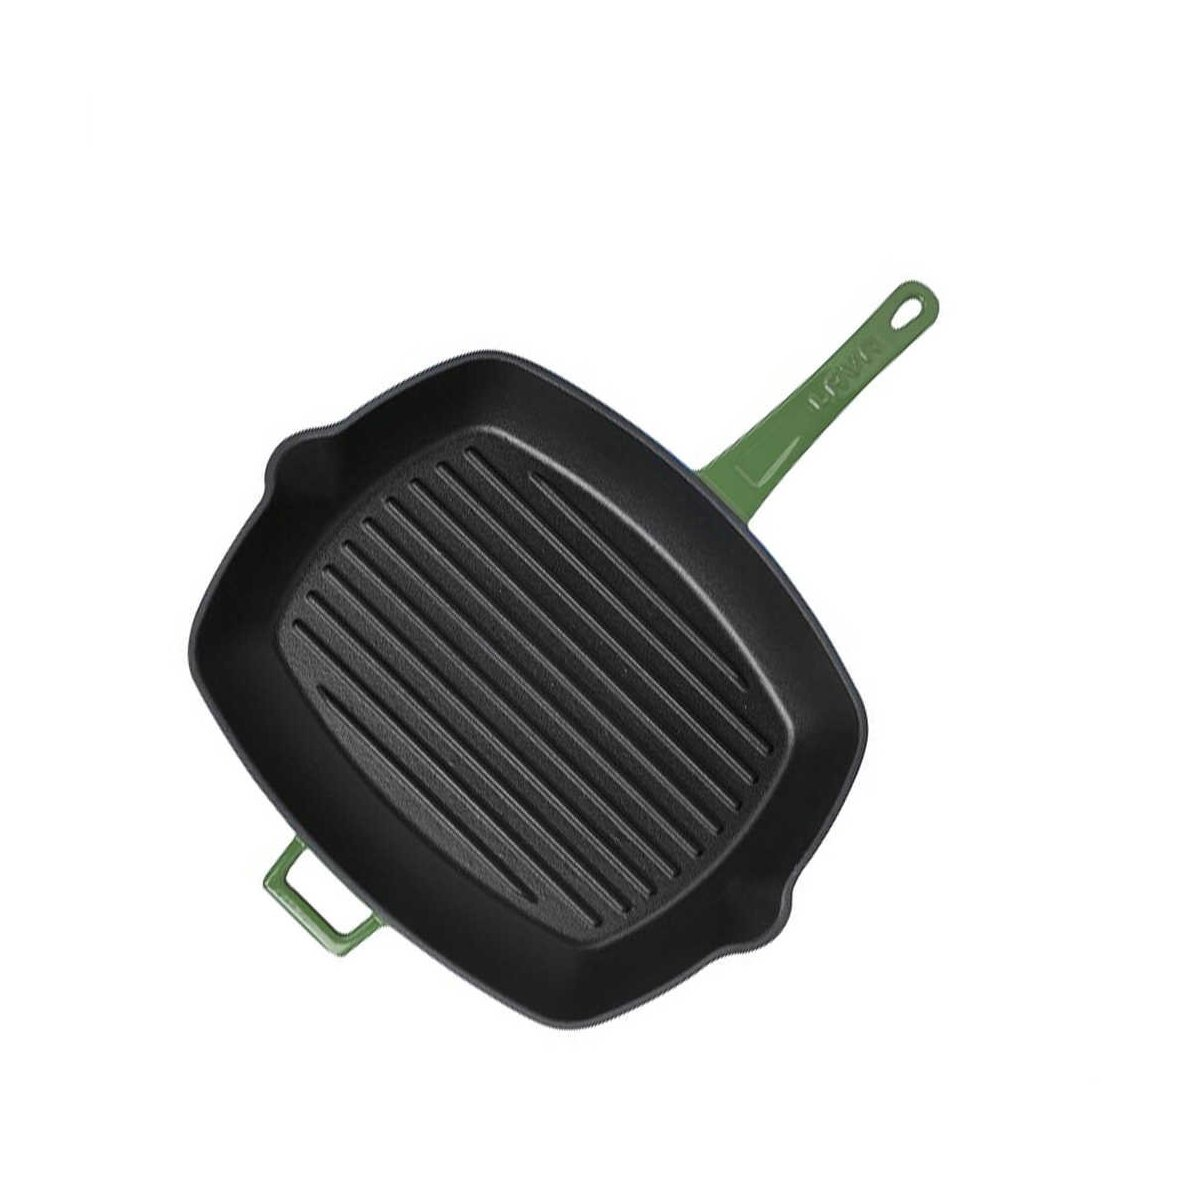 Lava Demir Döküm Metal Kulplu Dikdörtgen Izgara Tava Yeşil 26X32 Cm